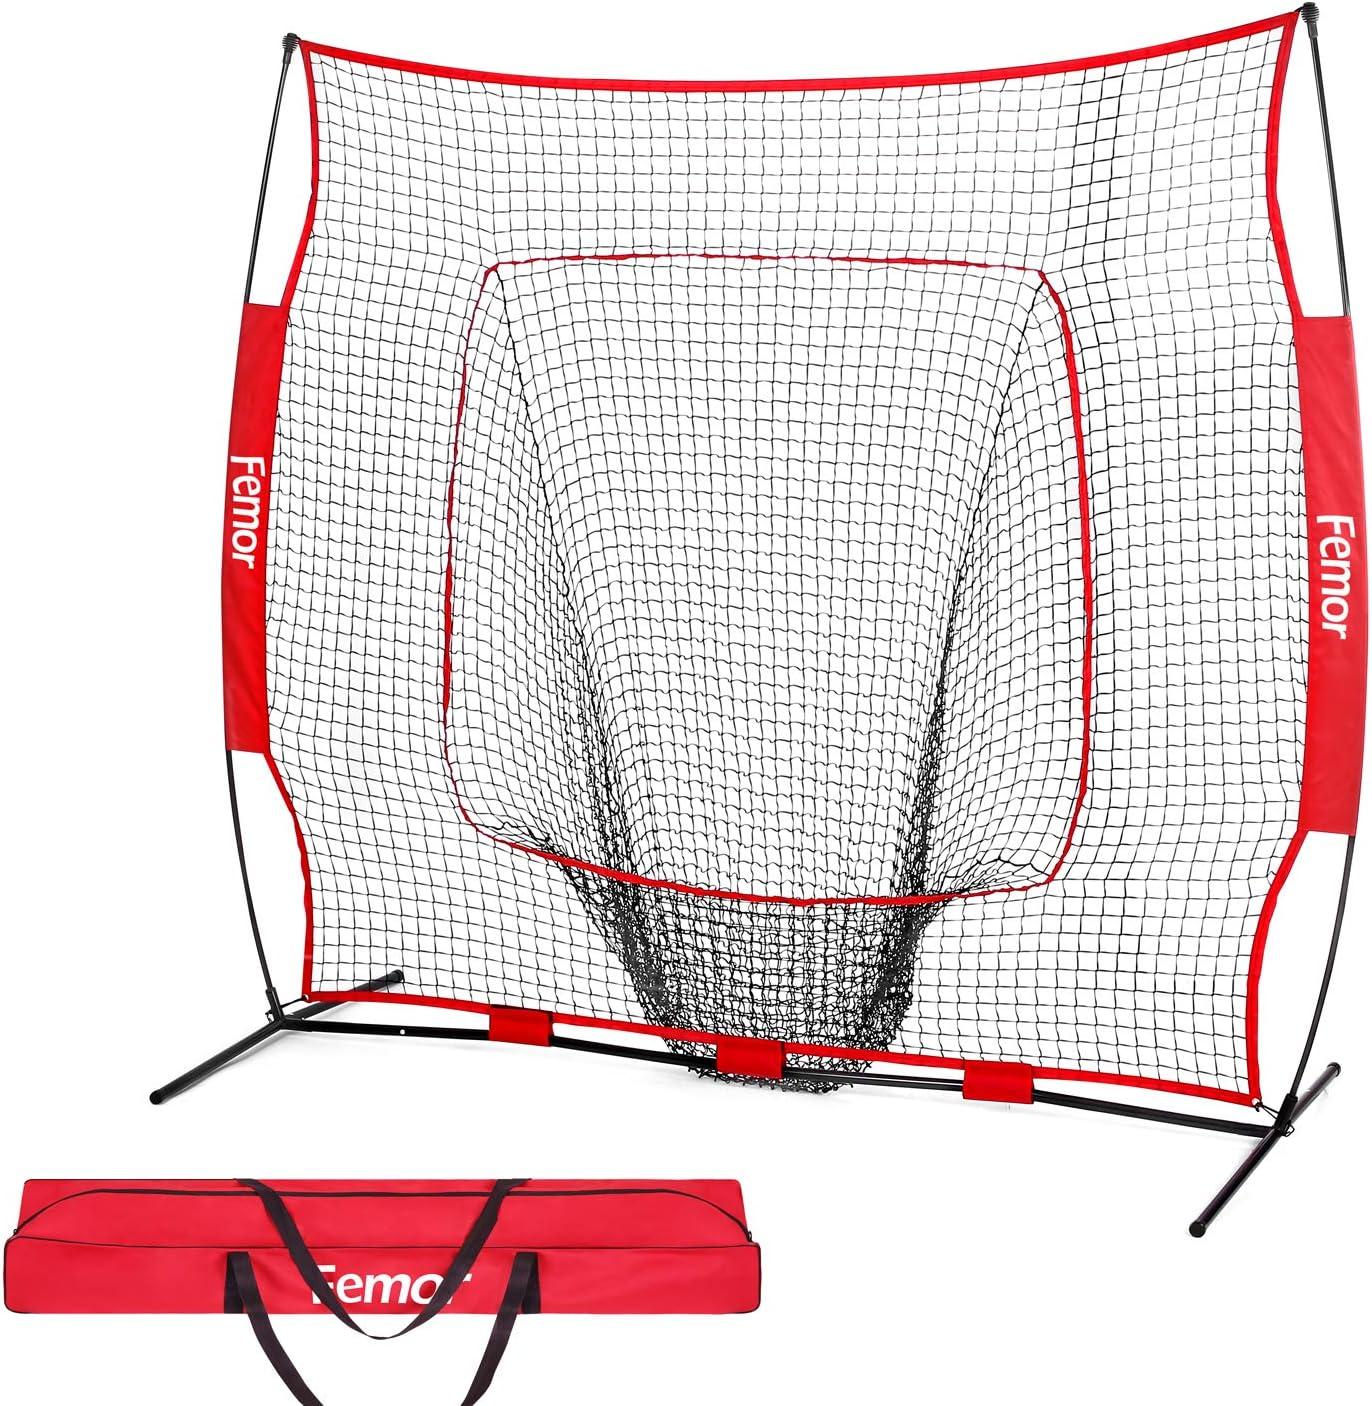 Alomejor Baseball Training Net Portable Baseball Softball Practice Net for Practice Hitting Pitching Batting Fielding Backstop